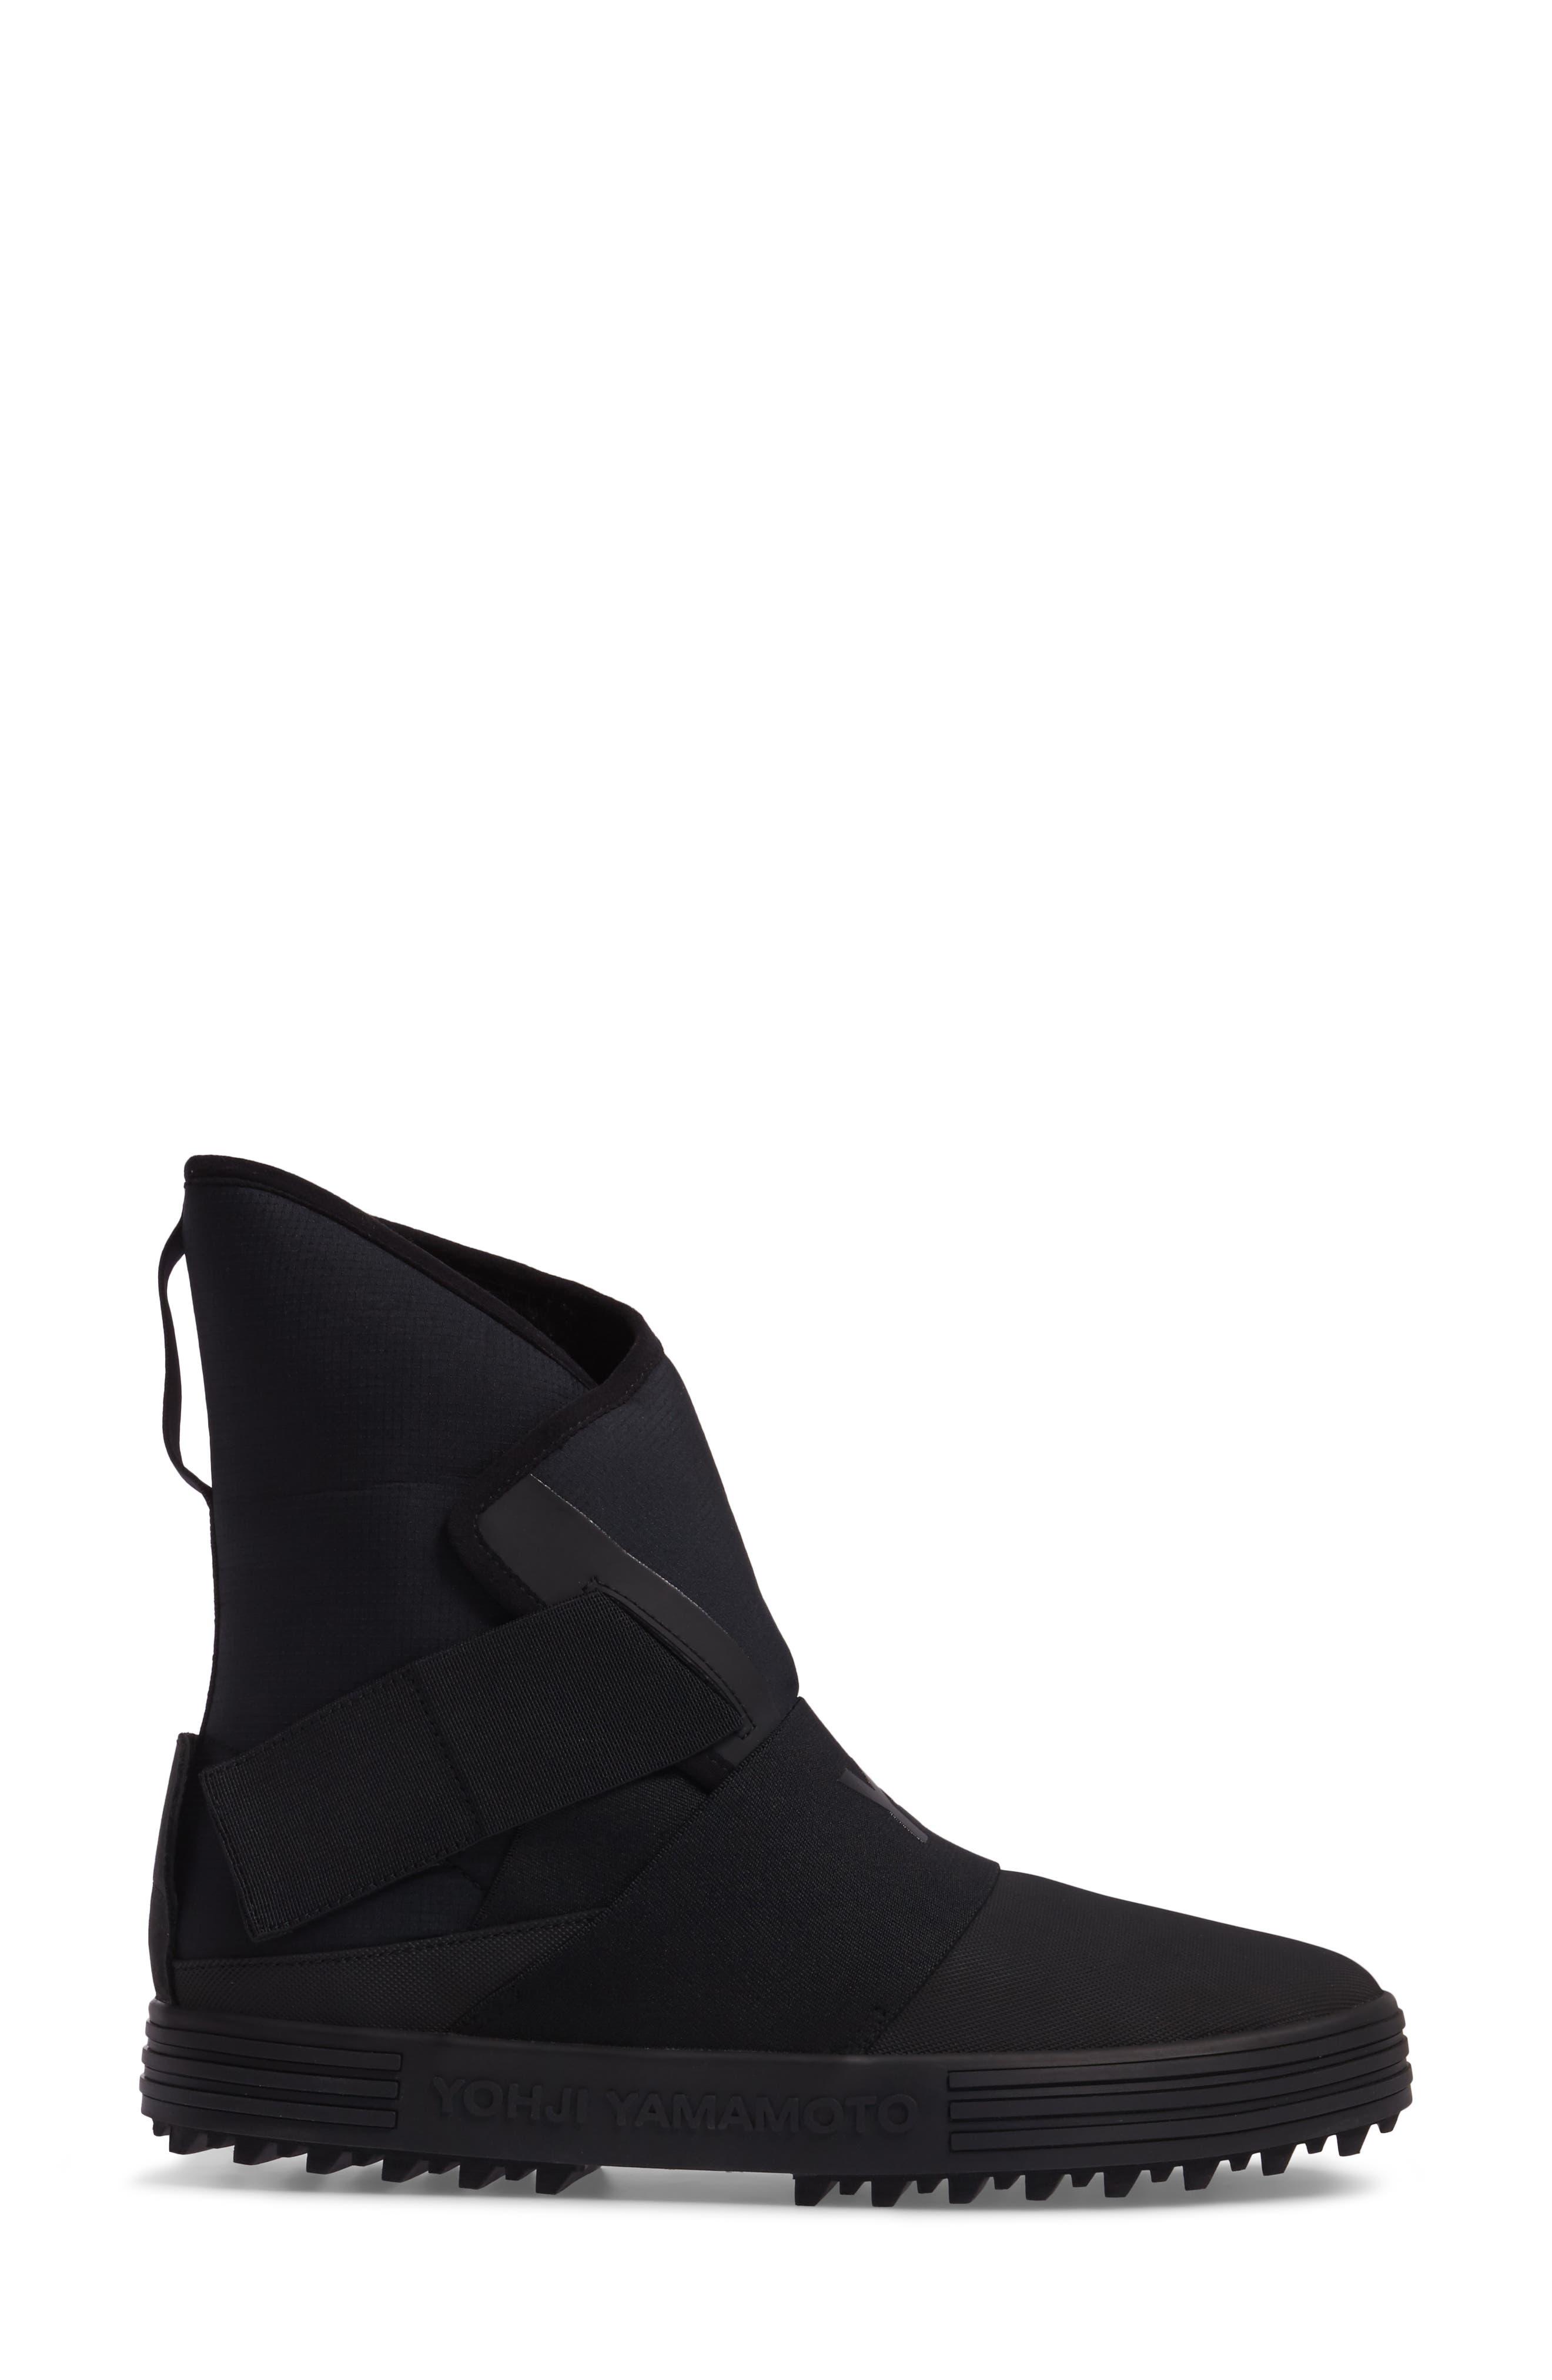 Sno Foxing High Top Sneaker,                             Alternate thumbnail 3, color,                             Core Black / White